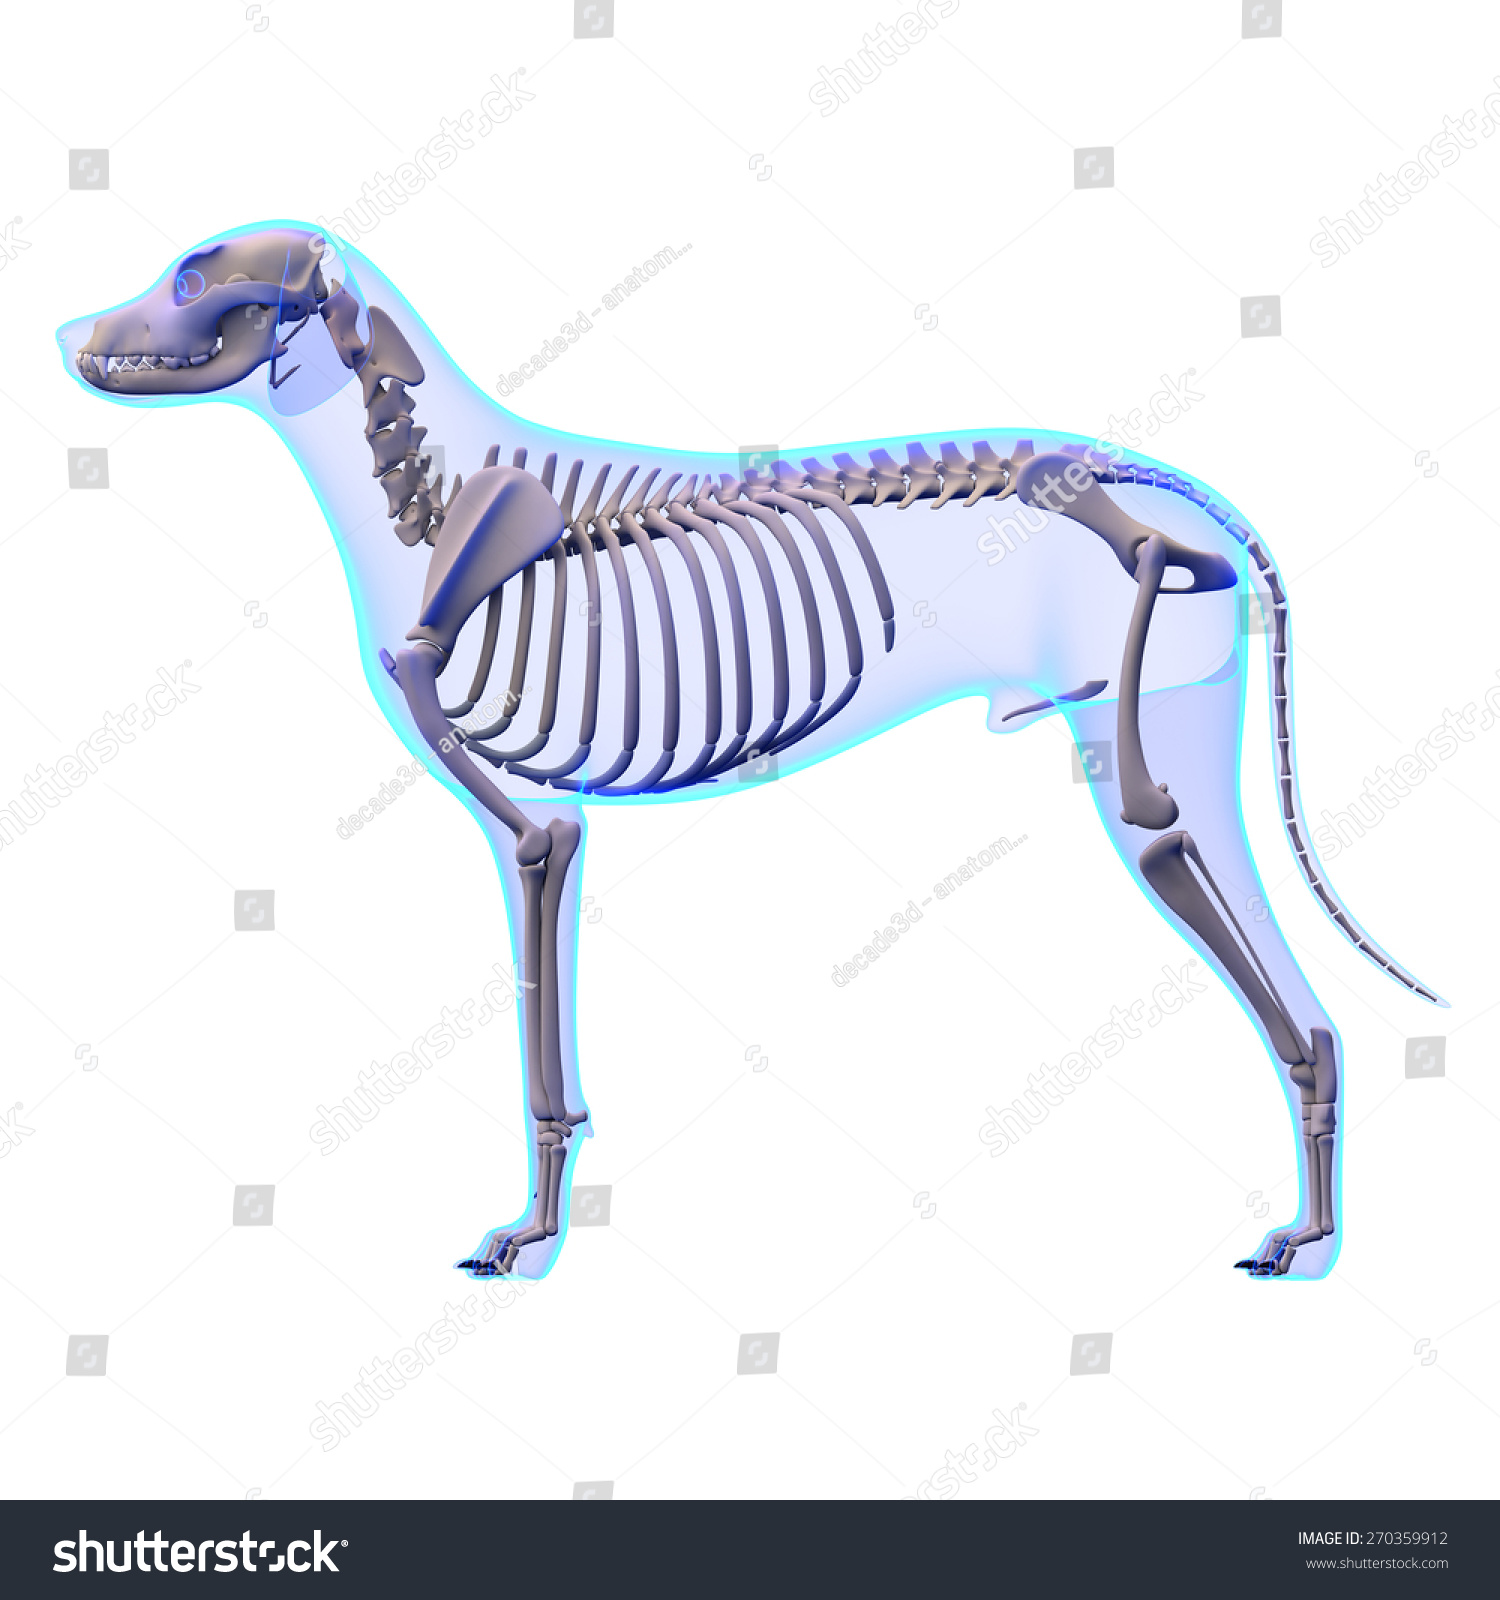 Royalty Free Stock Illustration of Dog Skeleton Anatomy Stock ...